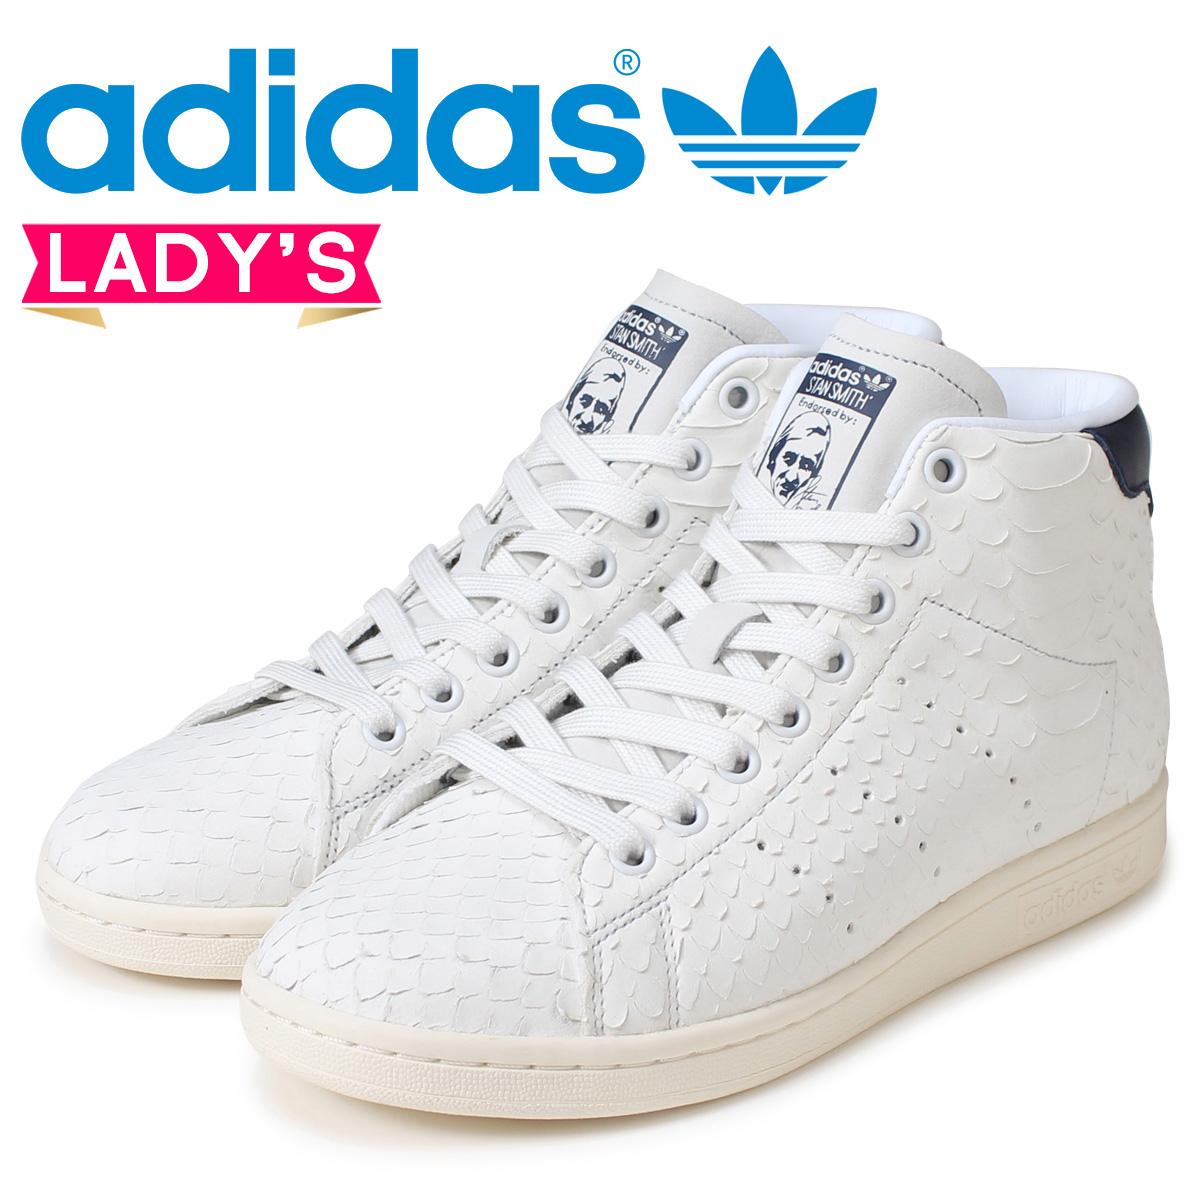 adidas Originals Stan Smith Lady's sneakers Adidas originals STAN SMITH MID W BB4862 shoes white